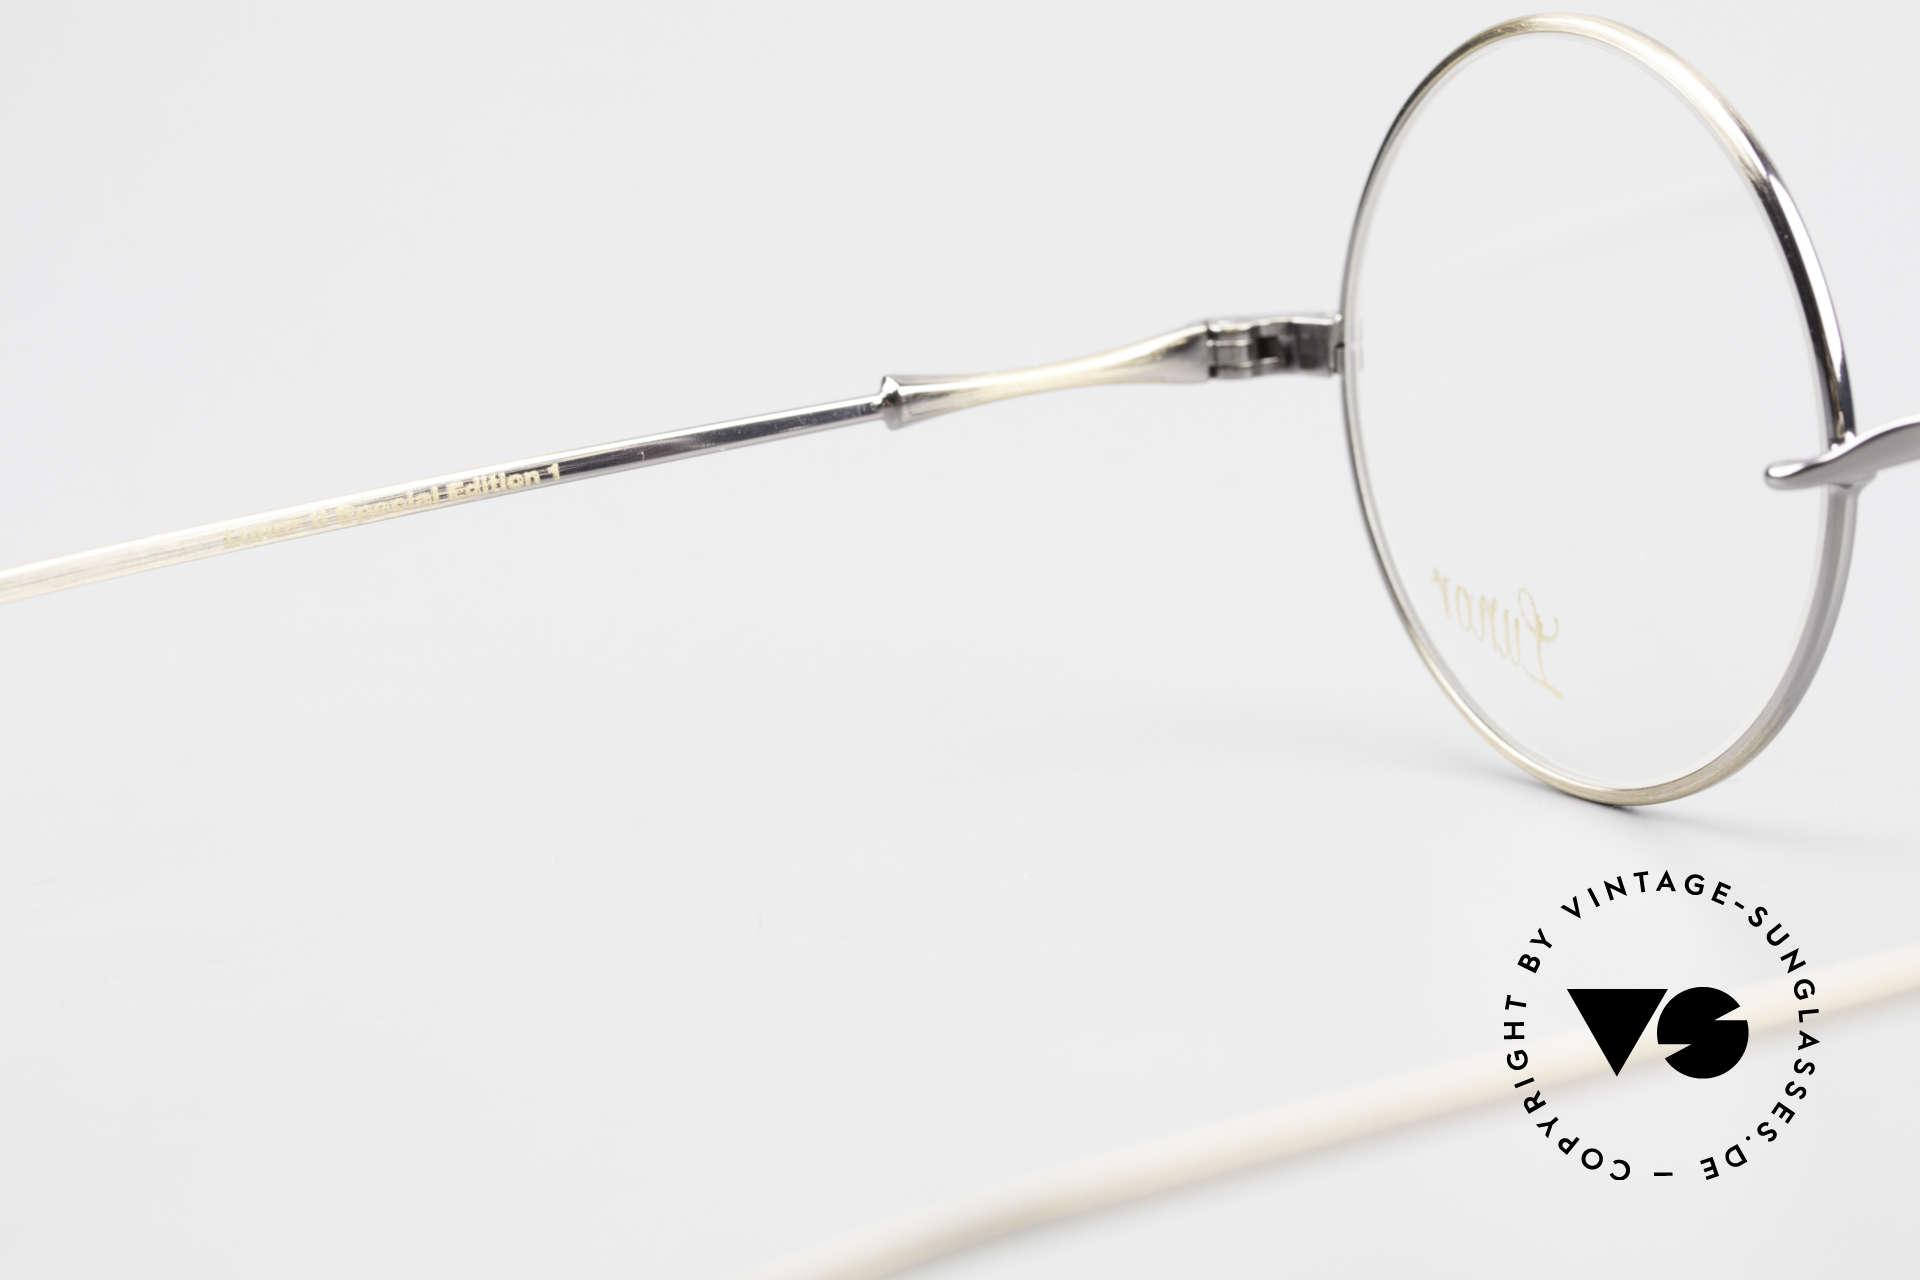 Lunor II 23 Round Lunor Eyeglass-Frame, Size: medium, Made for Men and Women